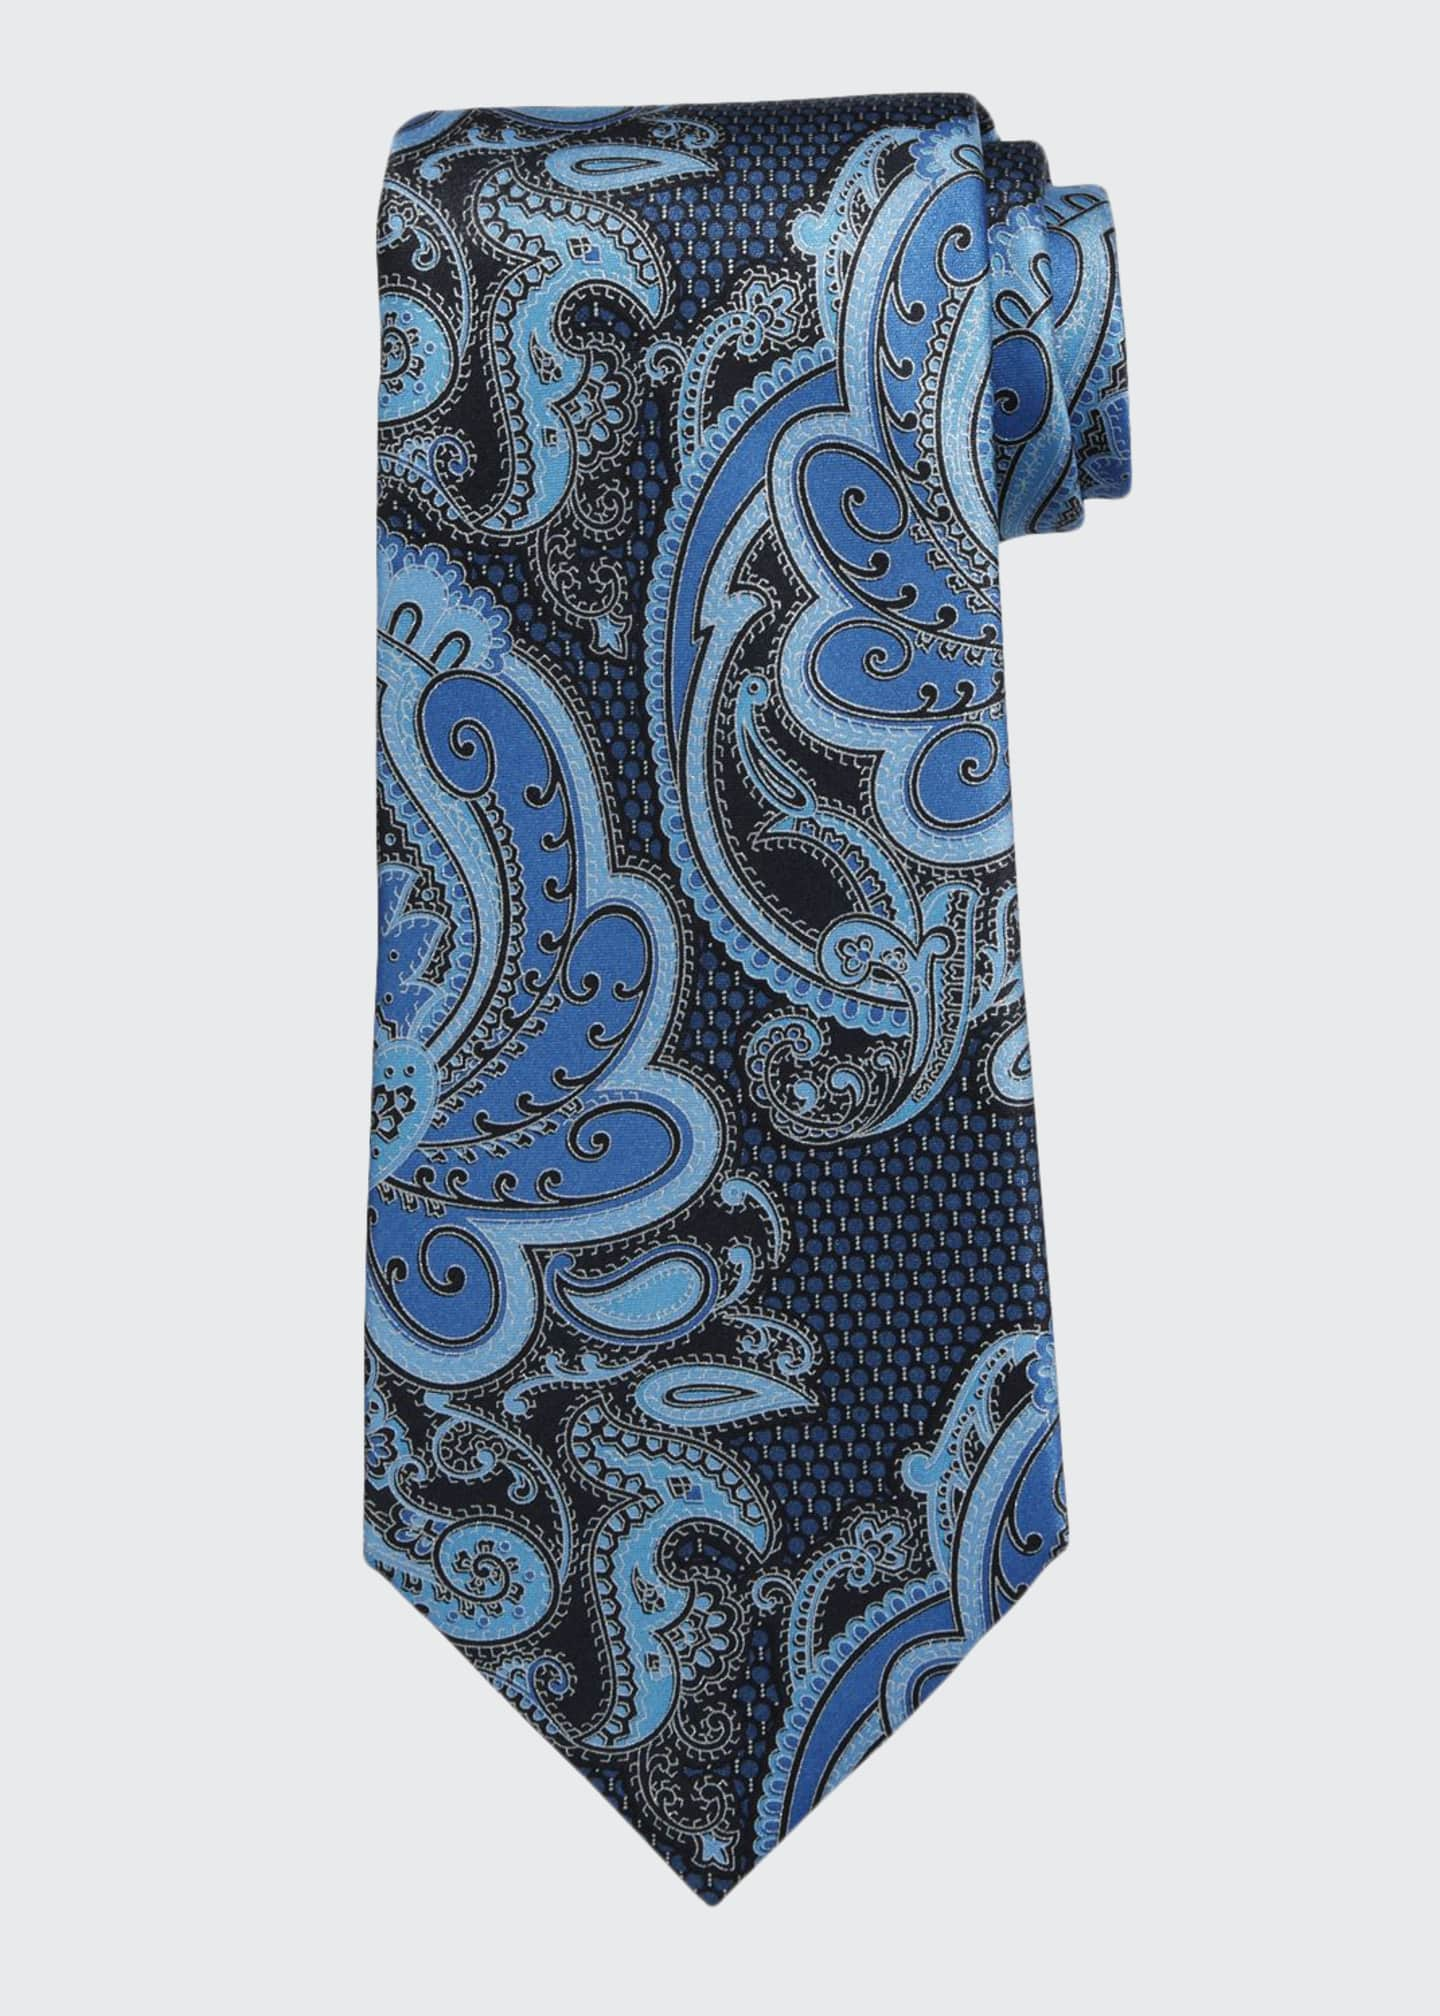 Ermenegildo Zegna Exploded Paisley Silk Tie, Navy/Blue